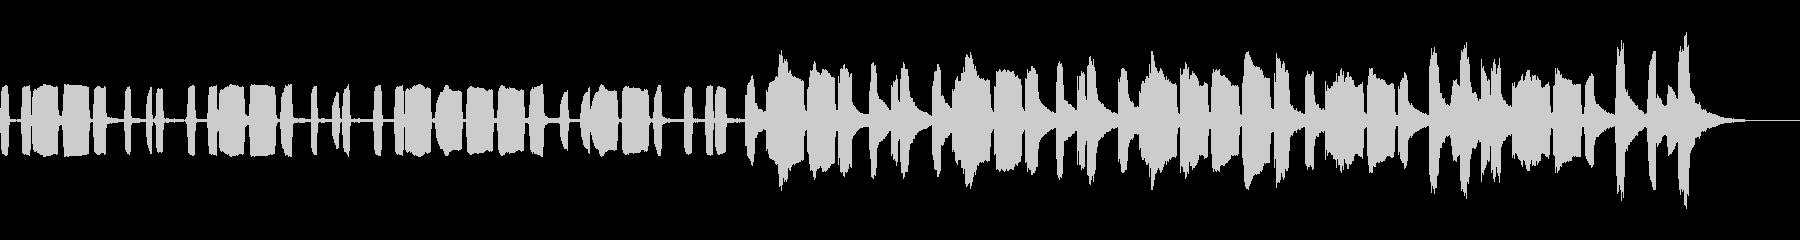 KANT可愛いハッピーバースデー1の未再生の波形